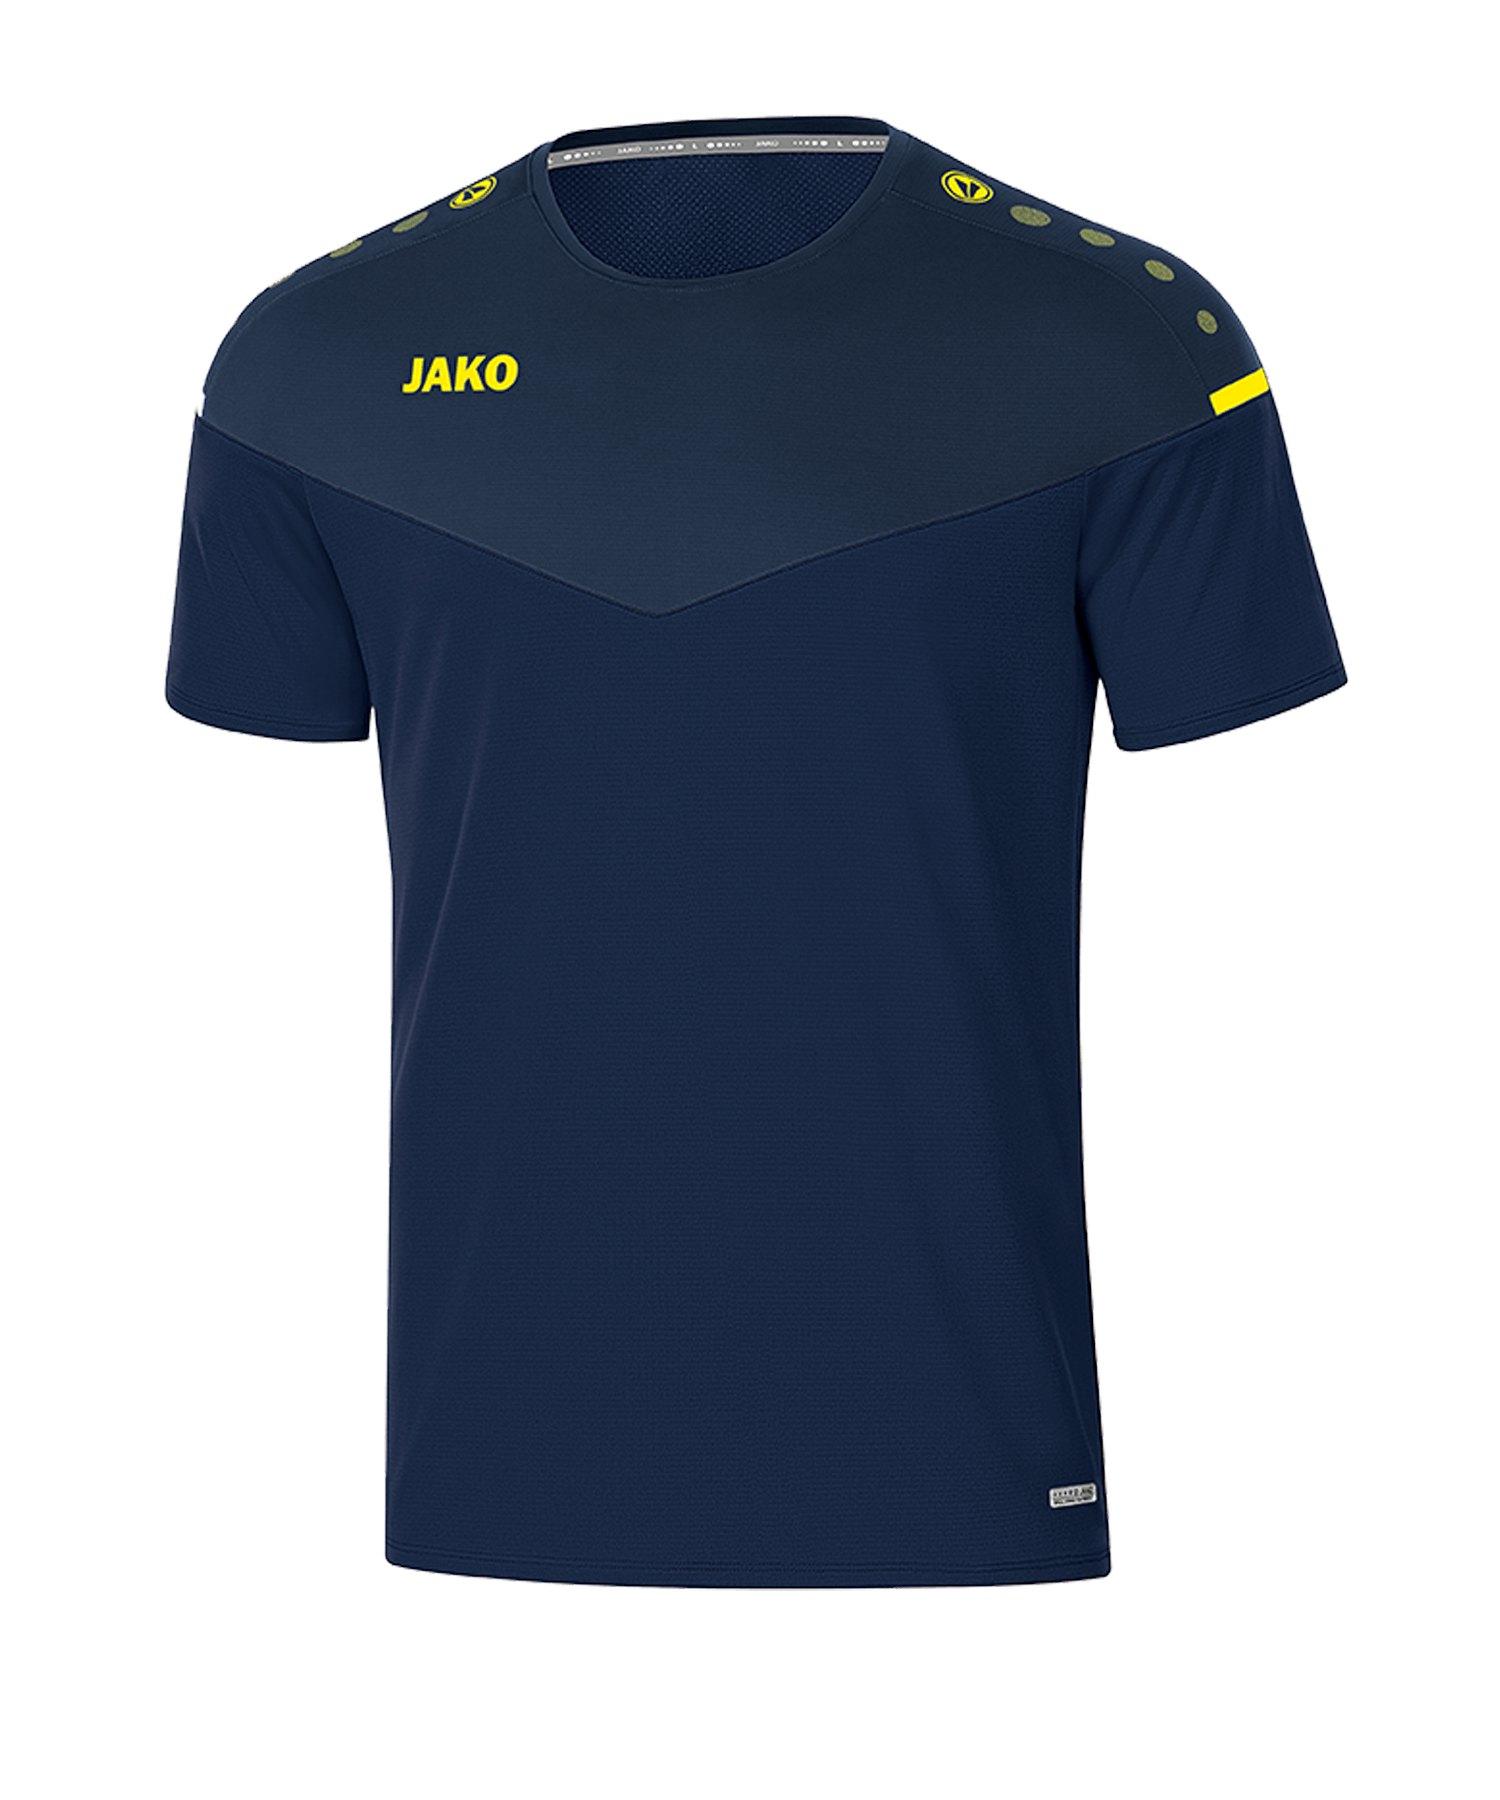 Jako Champ 2.0 T-Shirt Kids Blau F93 - blau